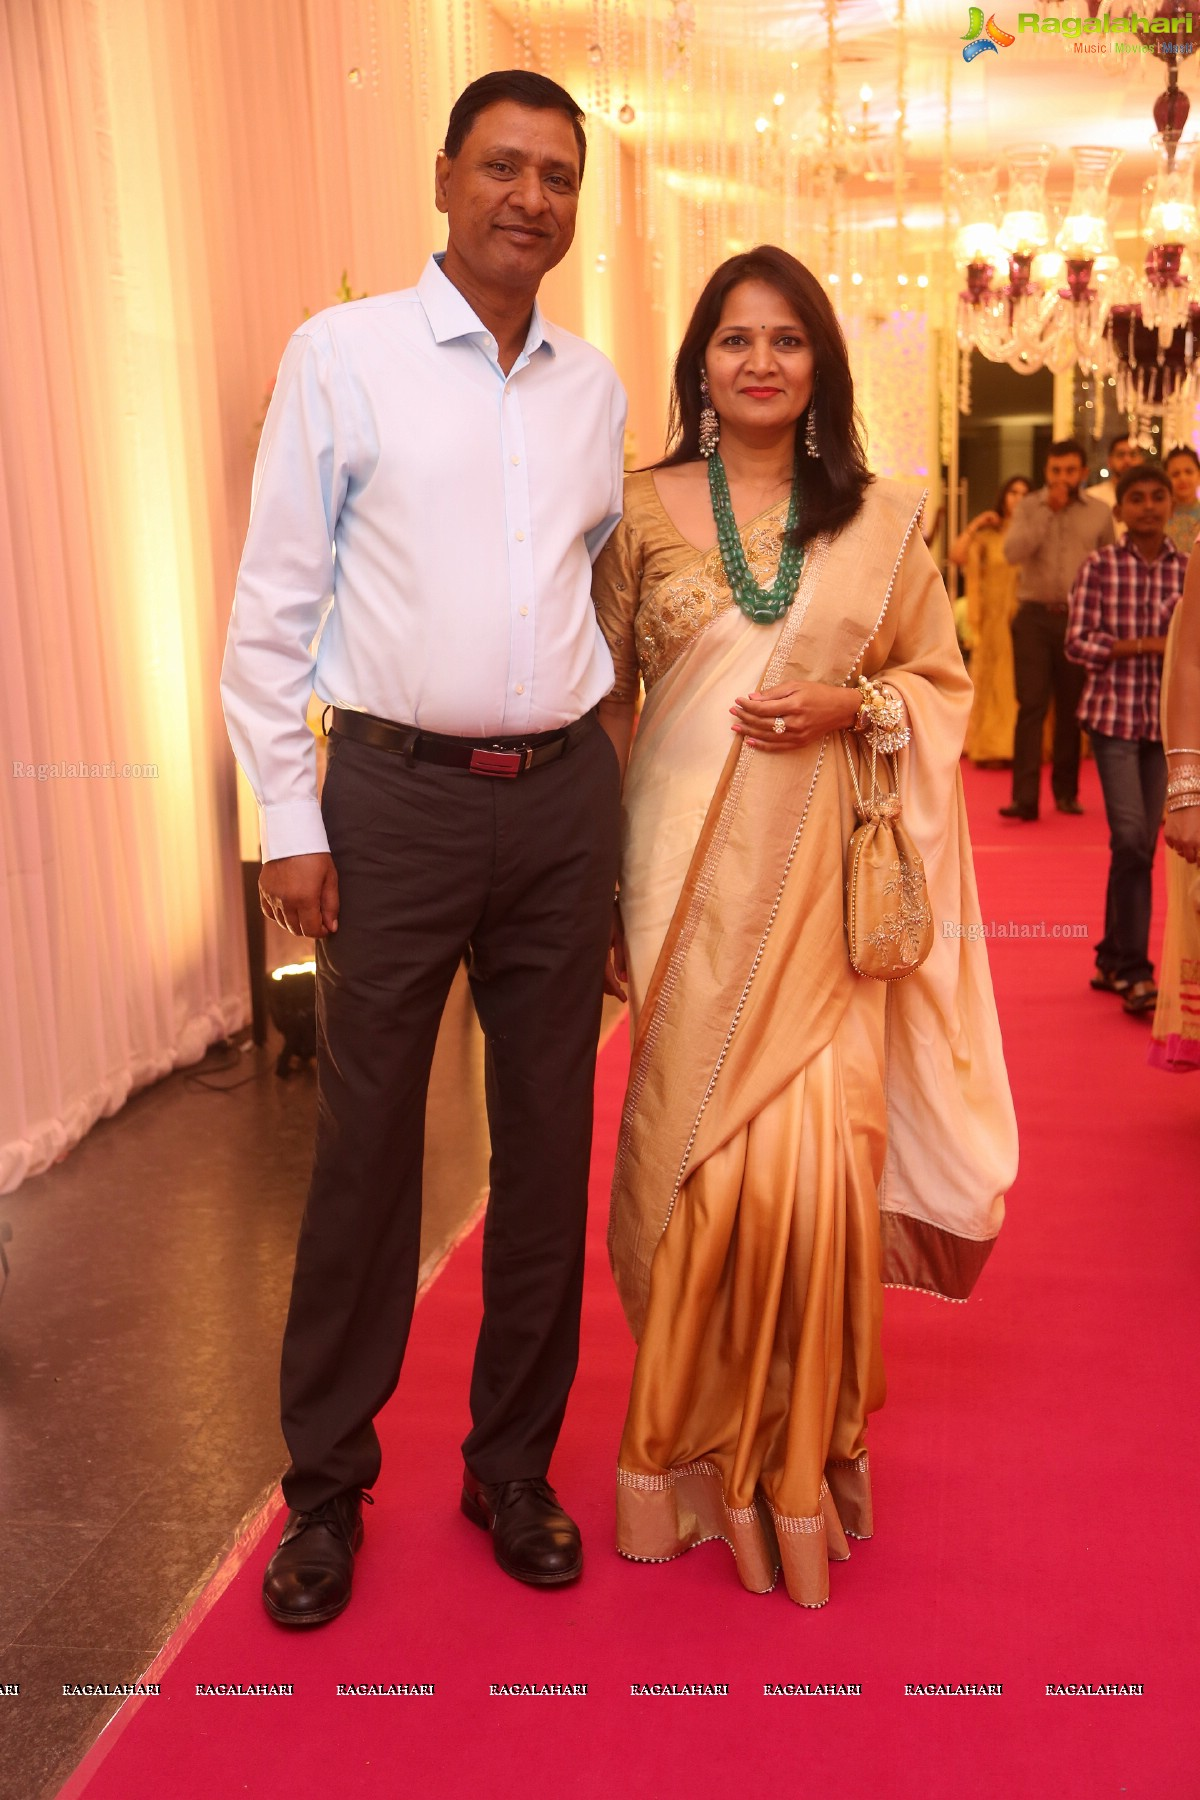 Ragalahari coverage grand engagement and sangeet - Miton cucine forum ...